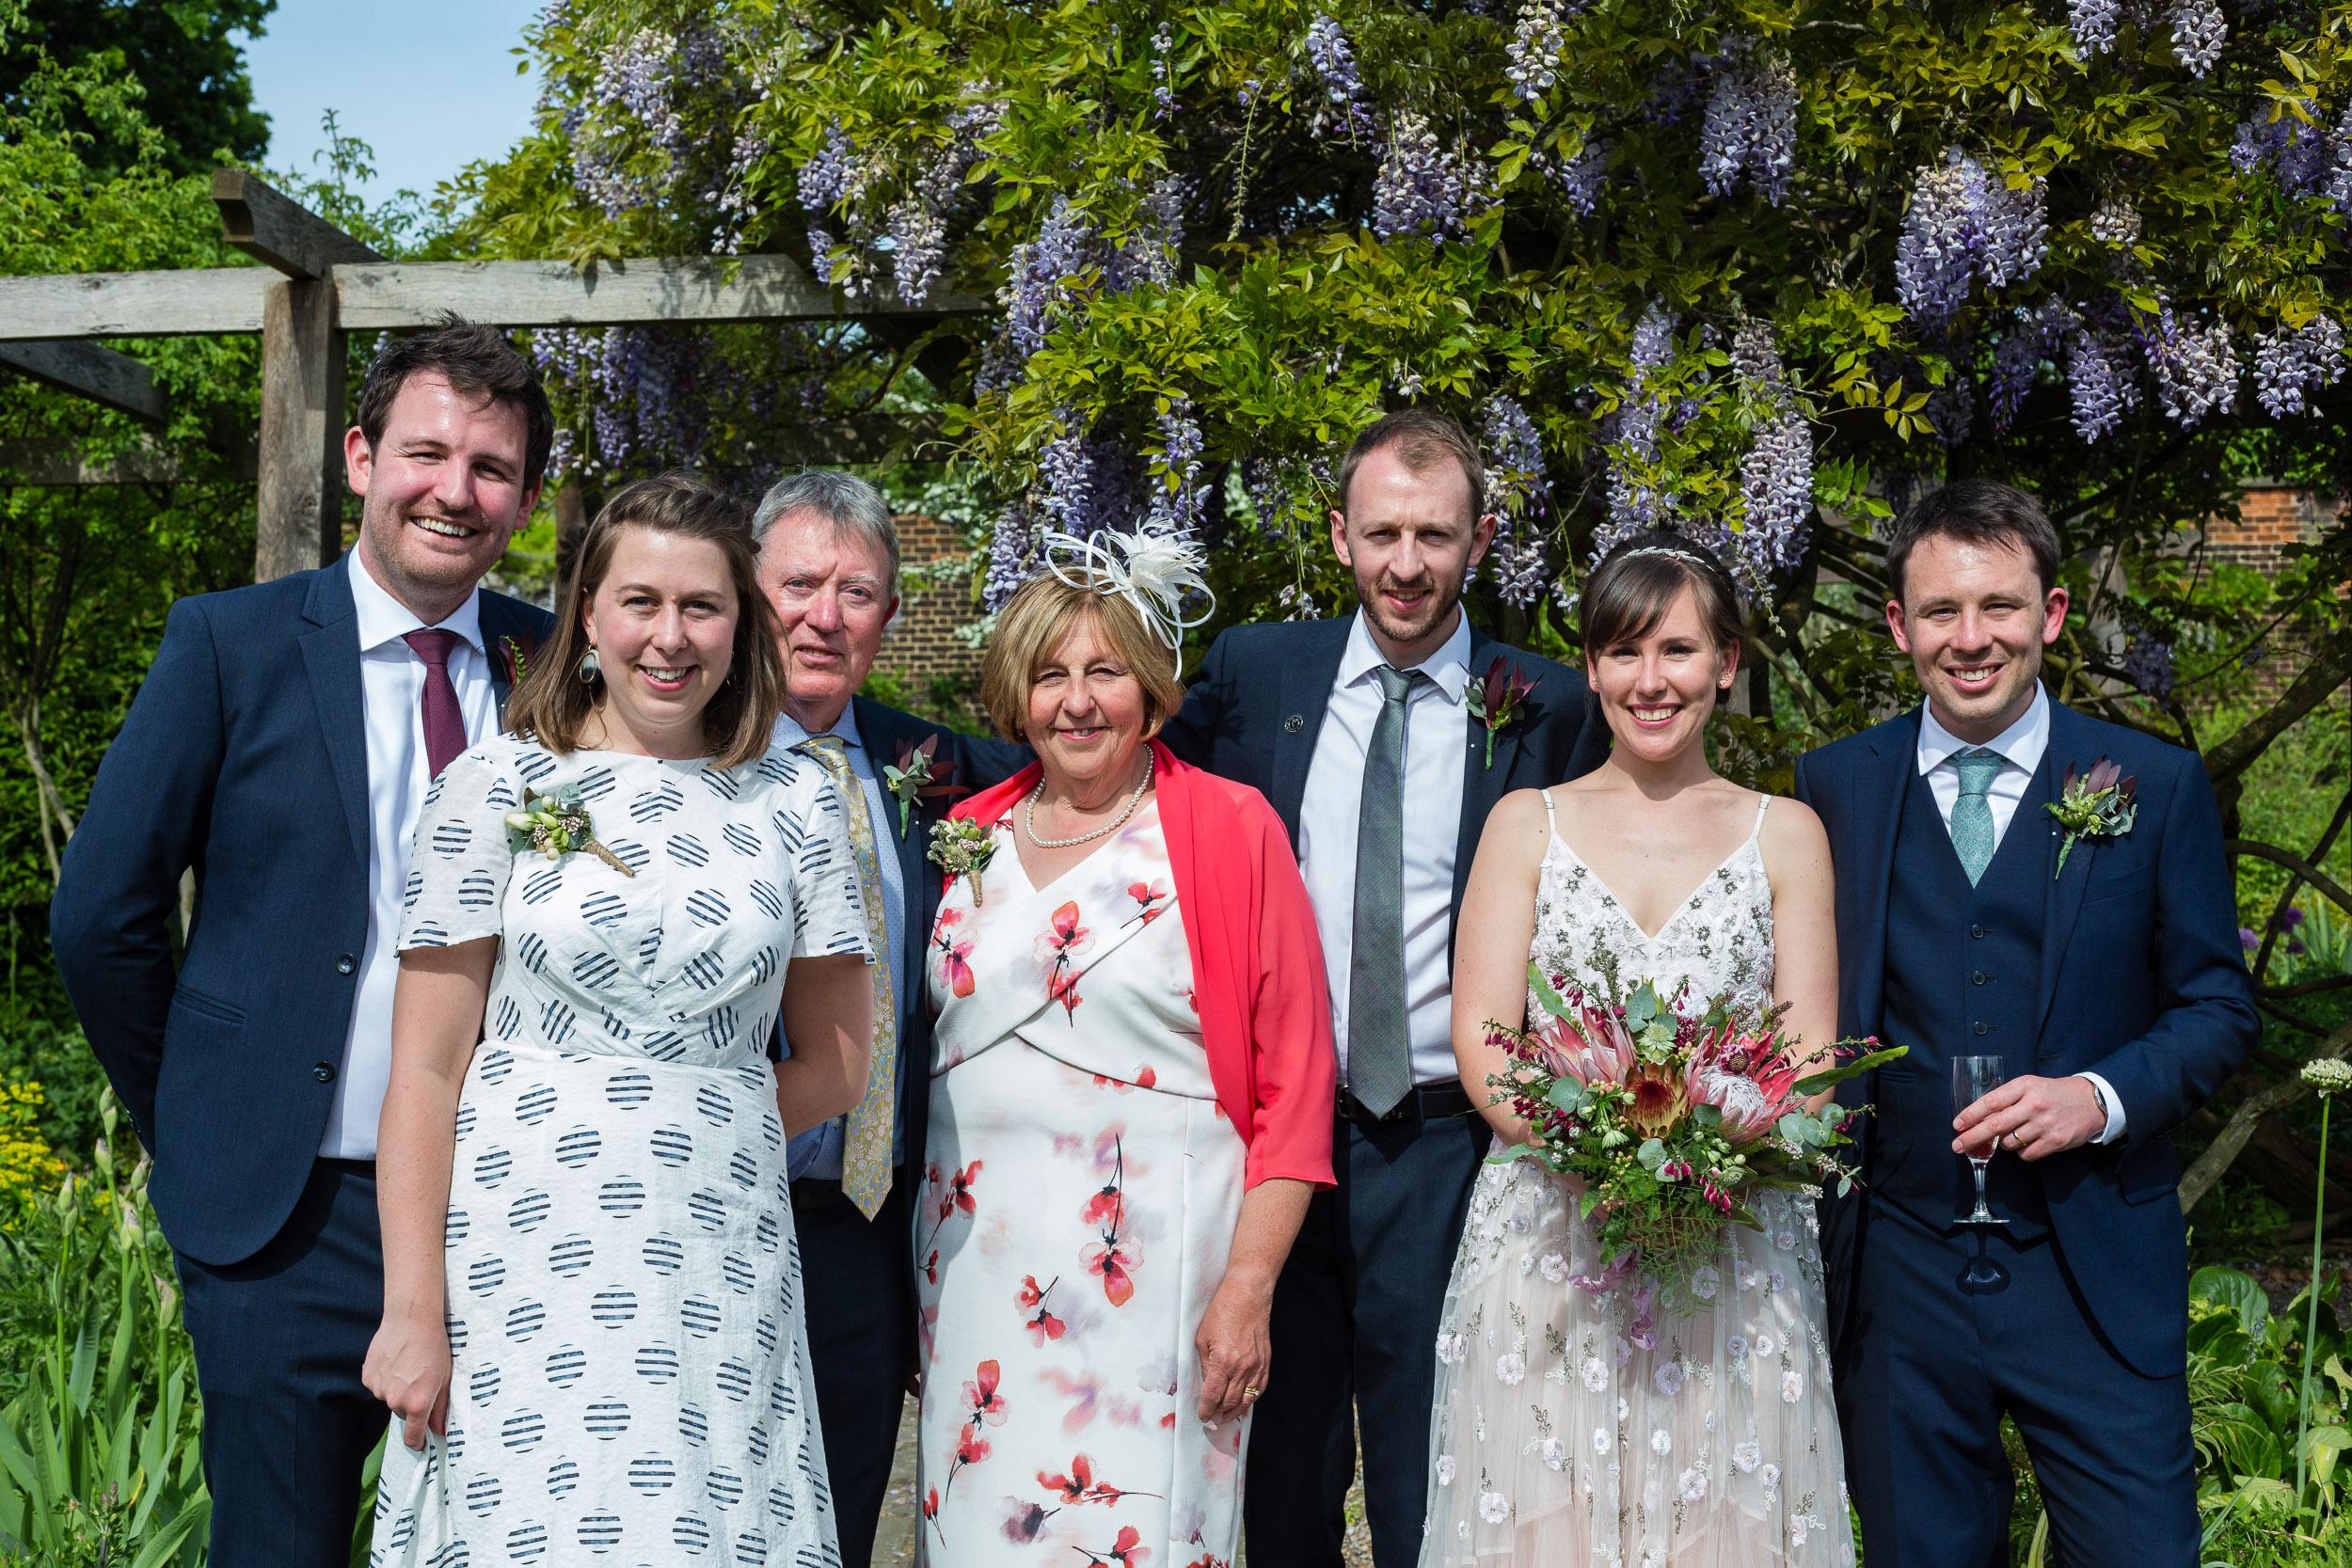 brockwell-lido-brixton-herne-hill-wedding-257.jpg